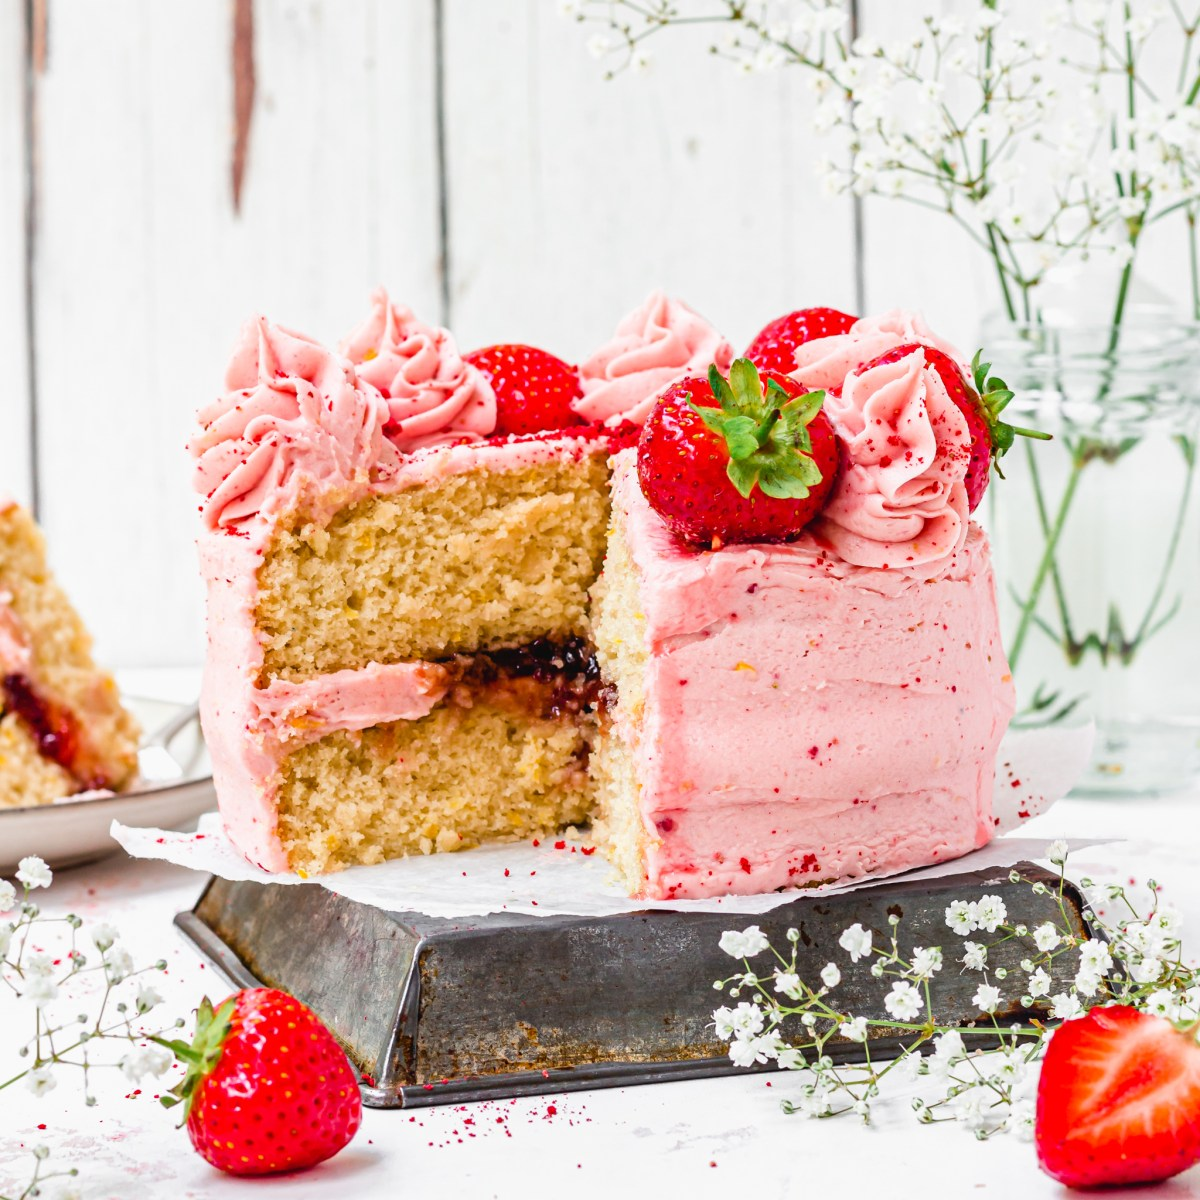 Vegan Strawberry Lemonade Cake